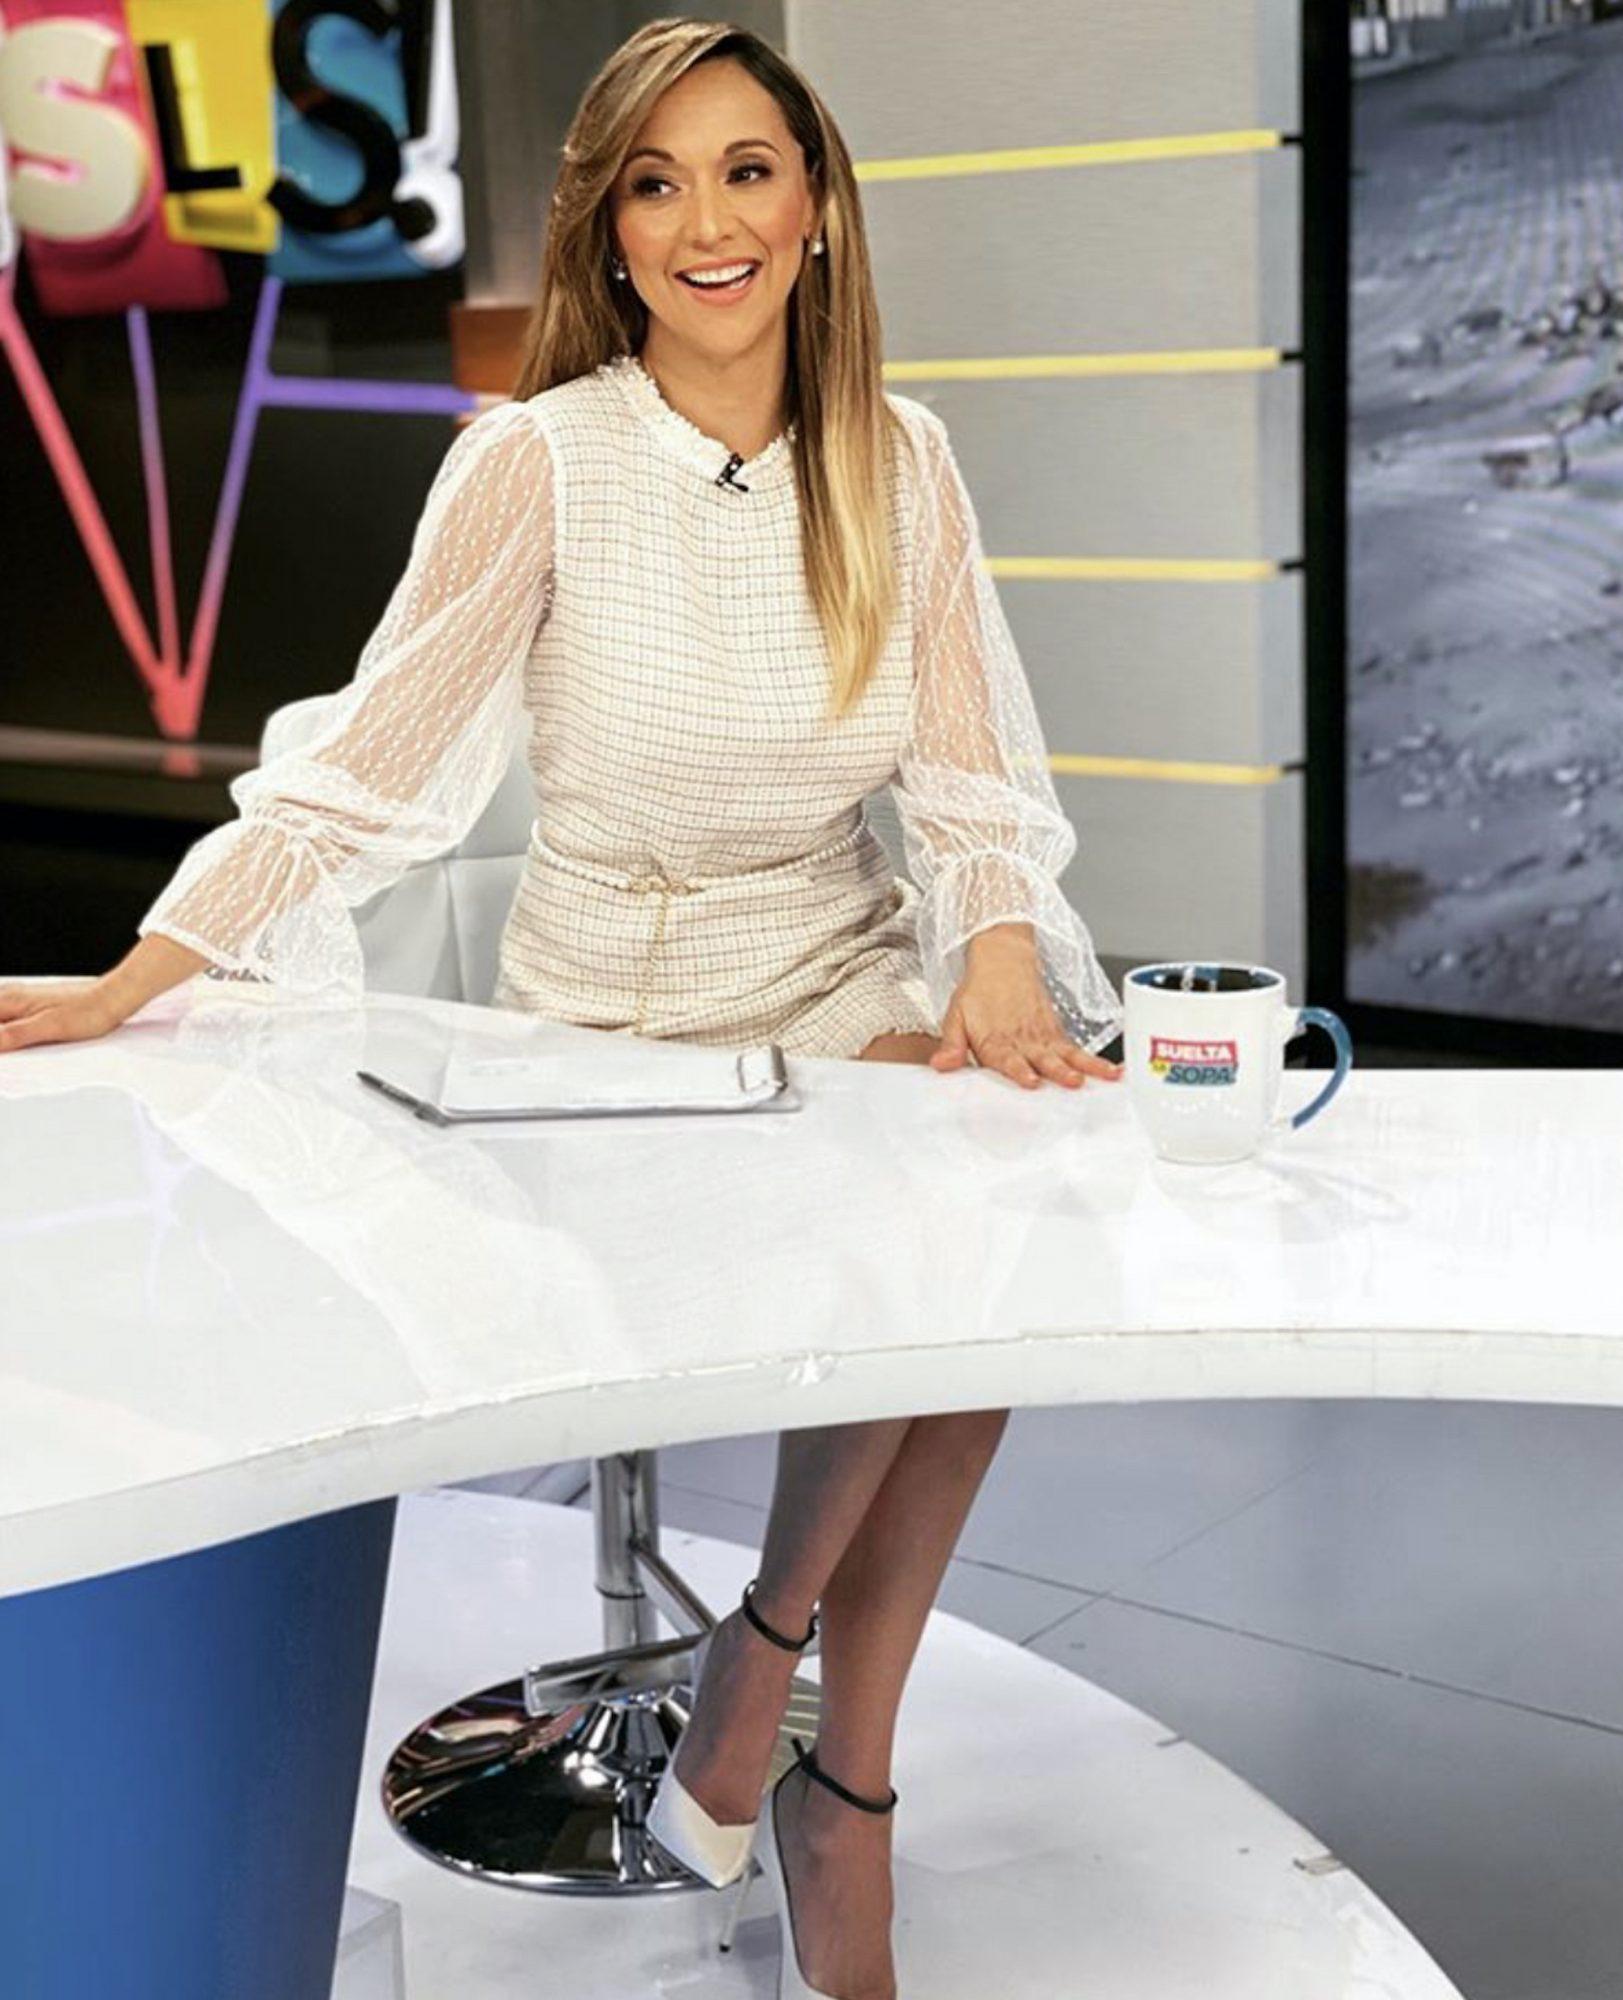 Veronica Bastos 2